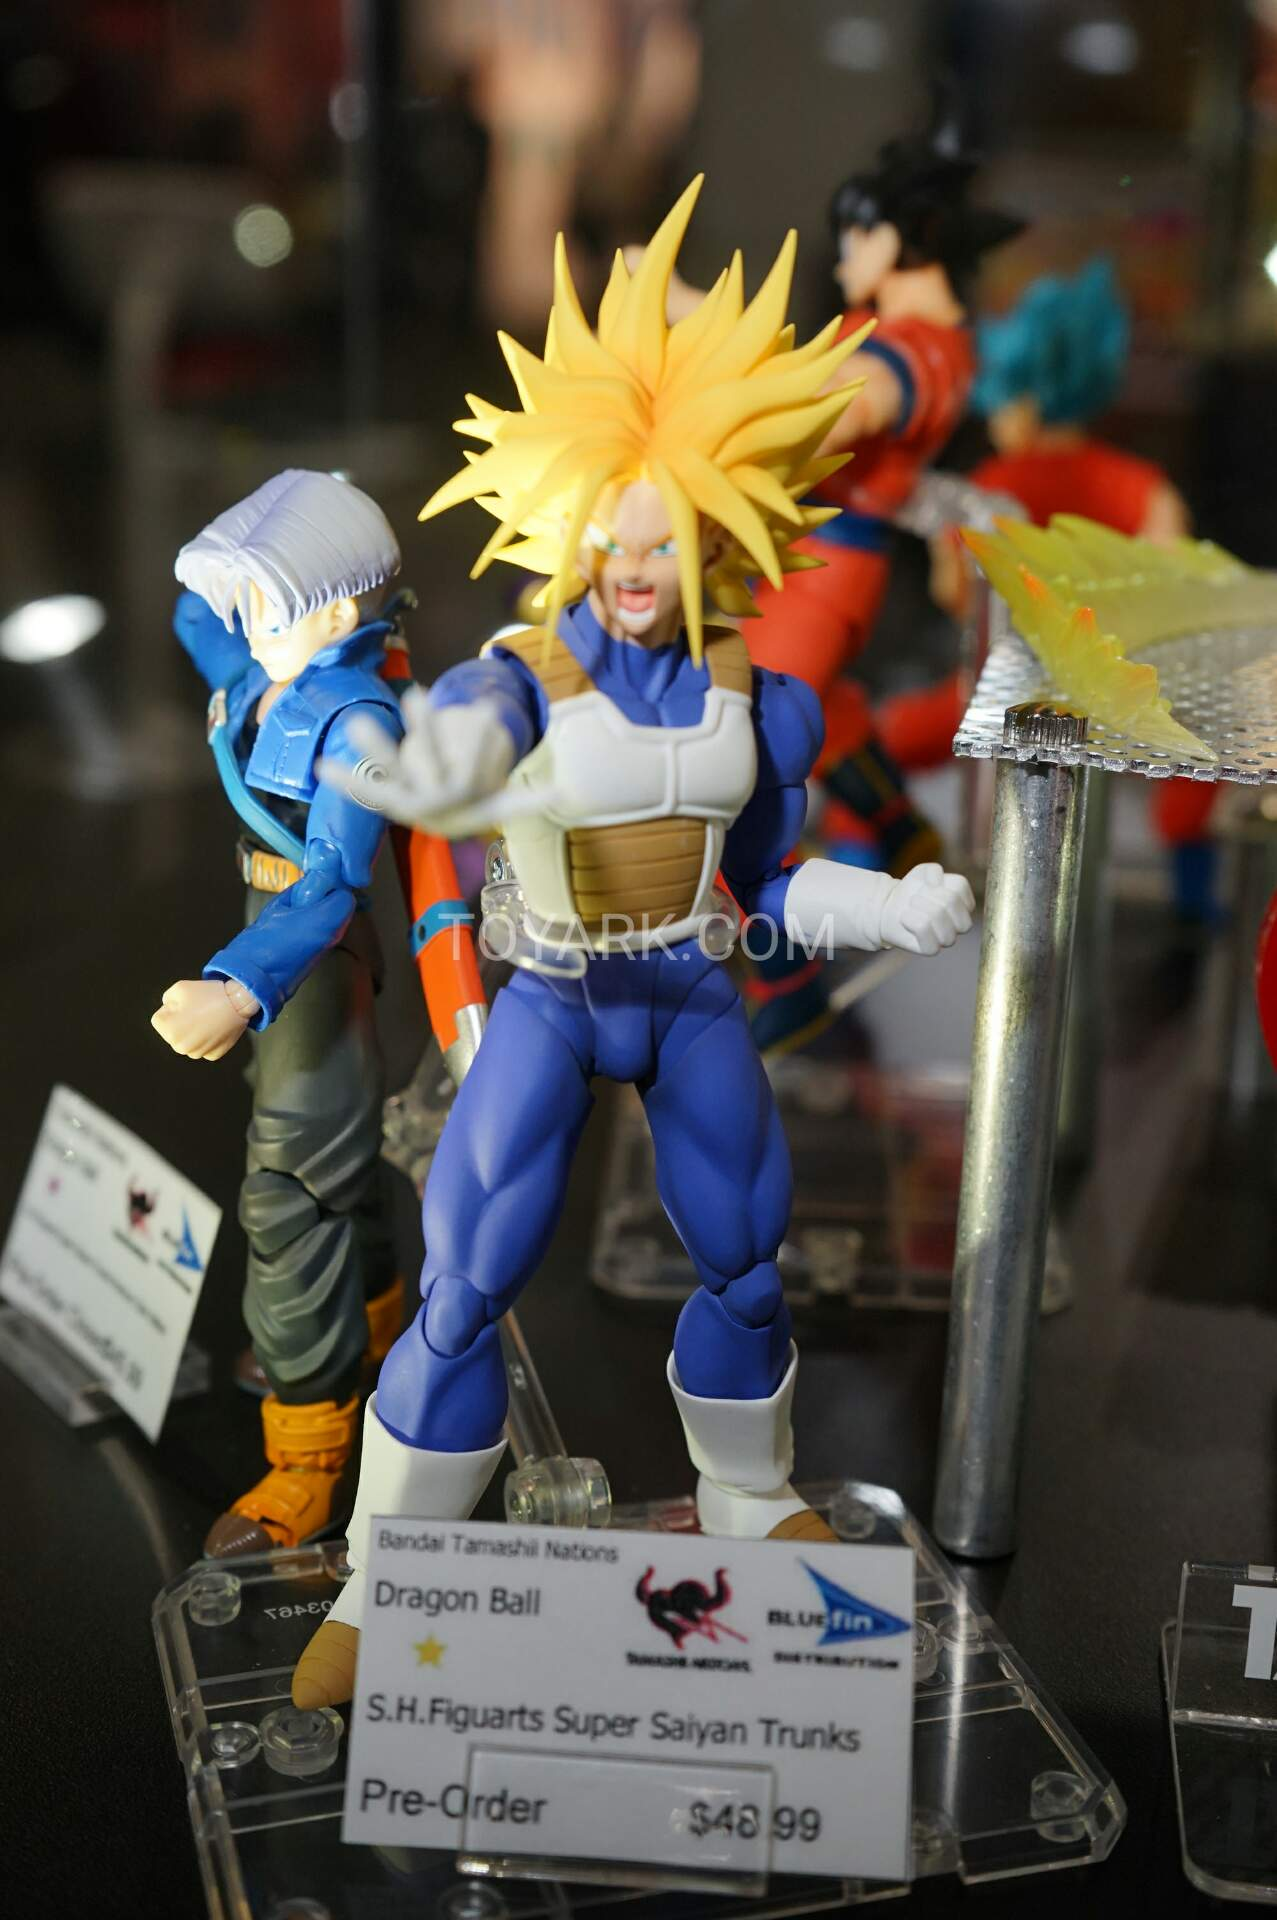 Dragon Ball Z Super SH Figuarts Armor Trunks Super Saiyan Head No Faces